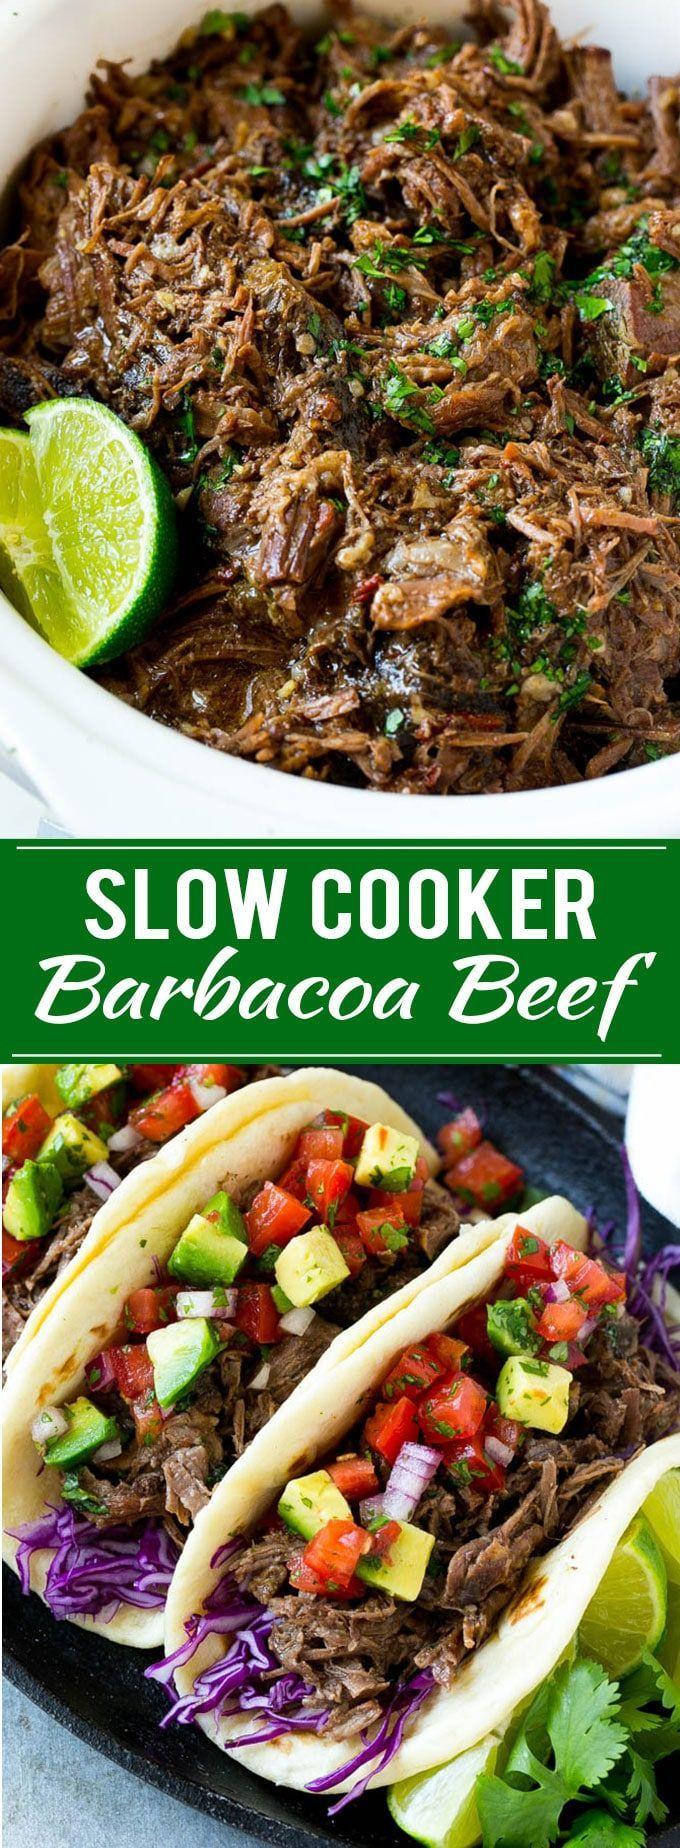 Barbacoa Beef Recipe   Slow Cooker Barbacoa   Chipotle Copycat Recipe   Mexican Beef Recipe